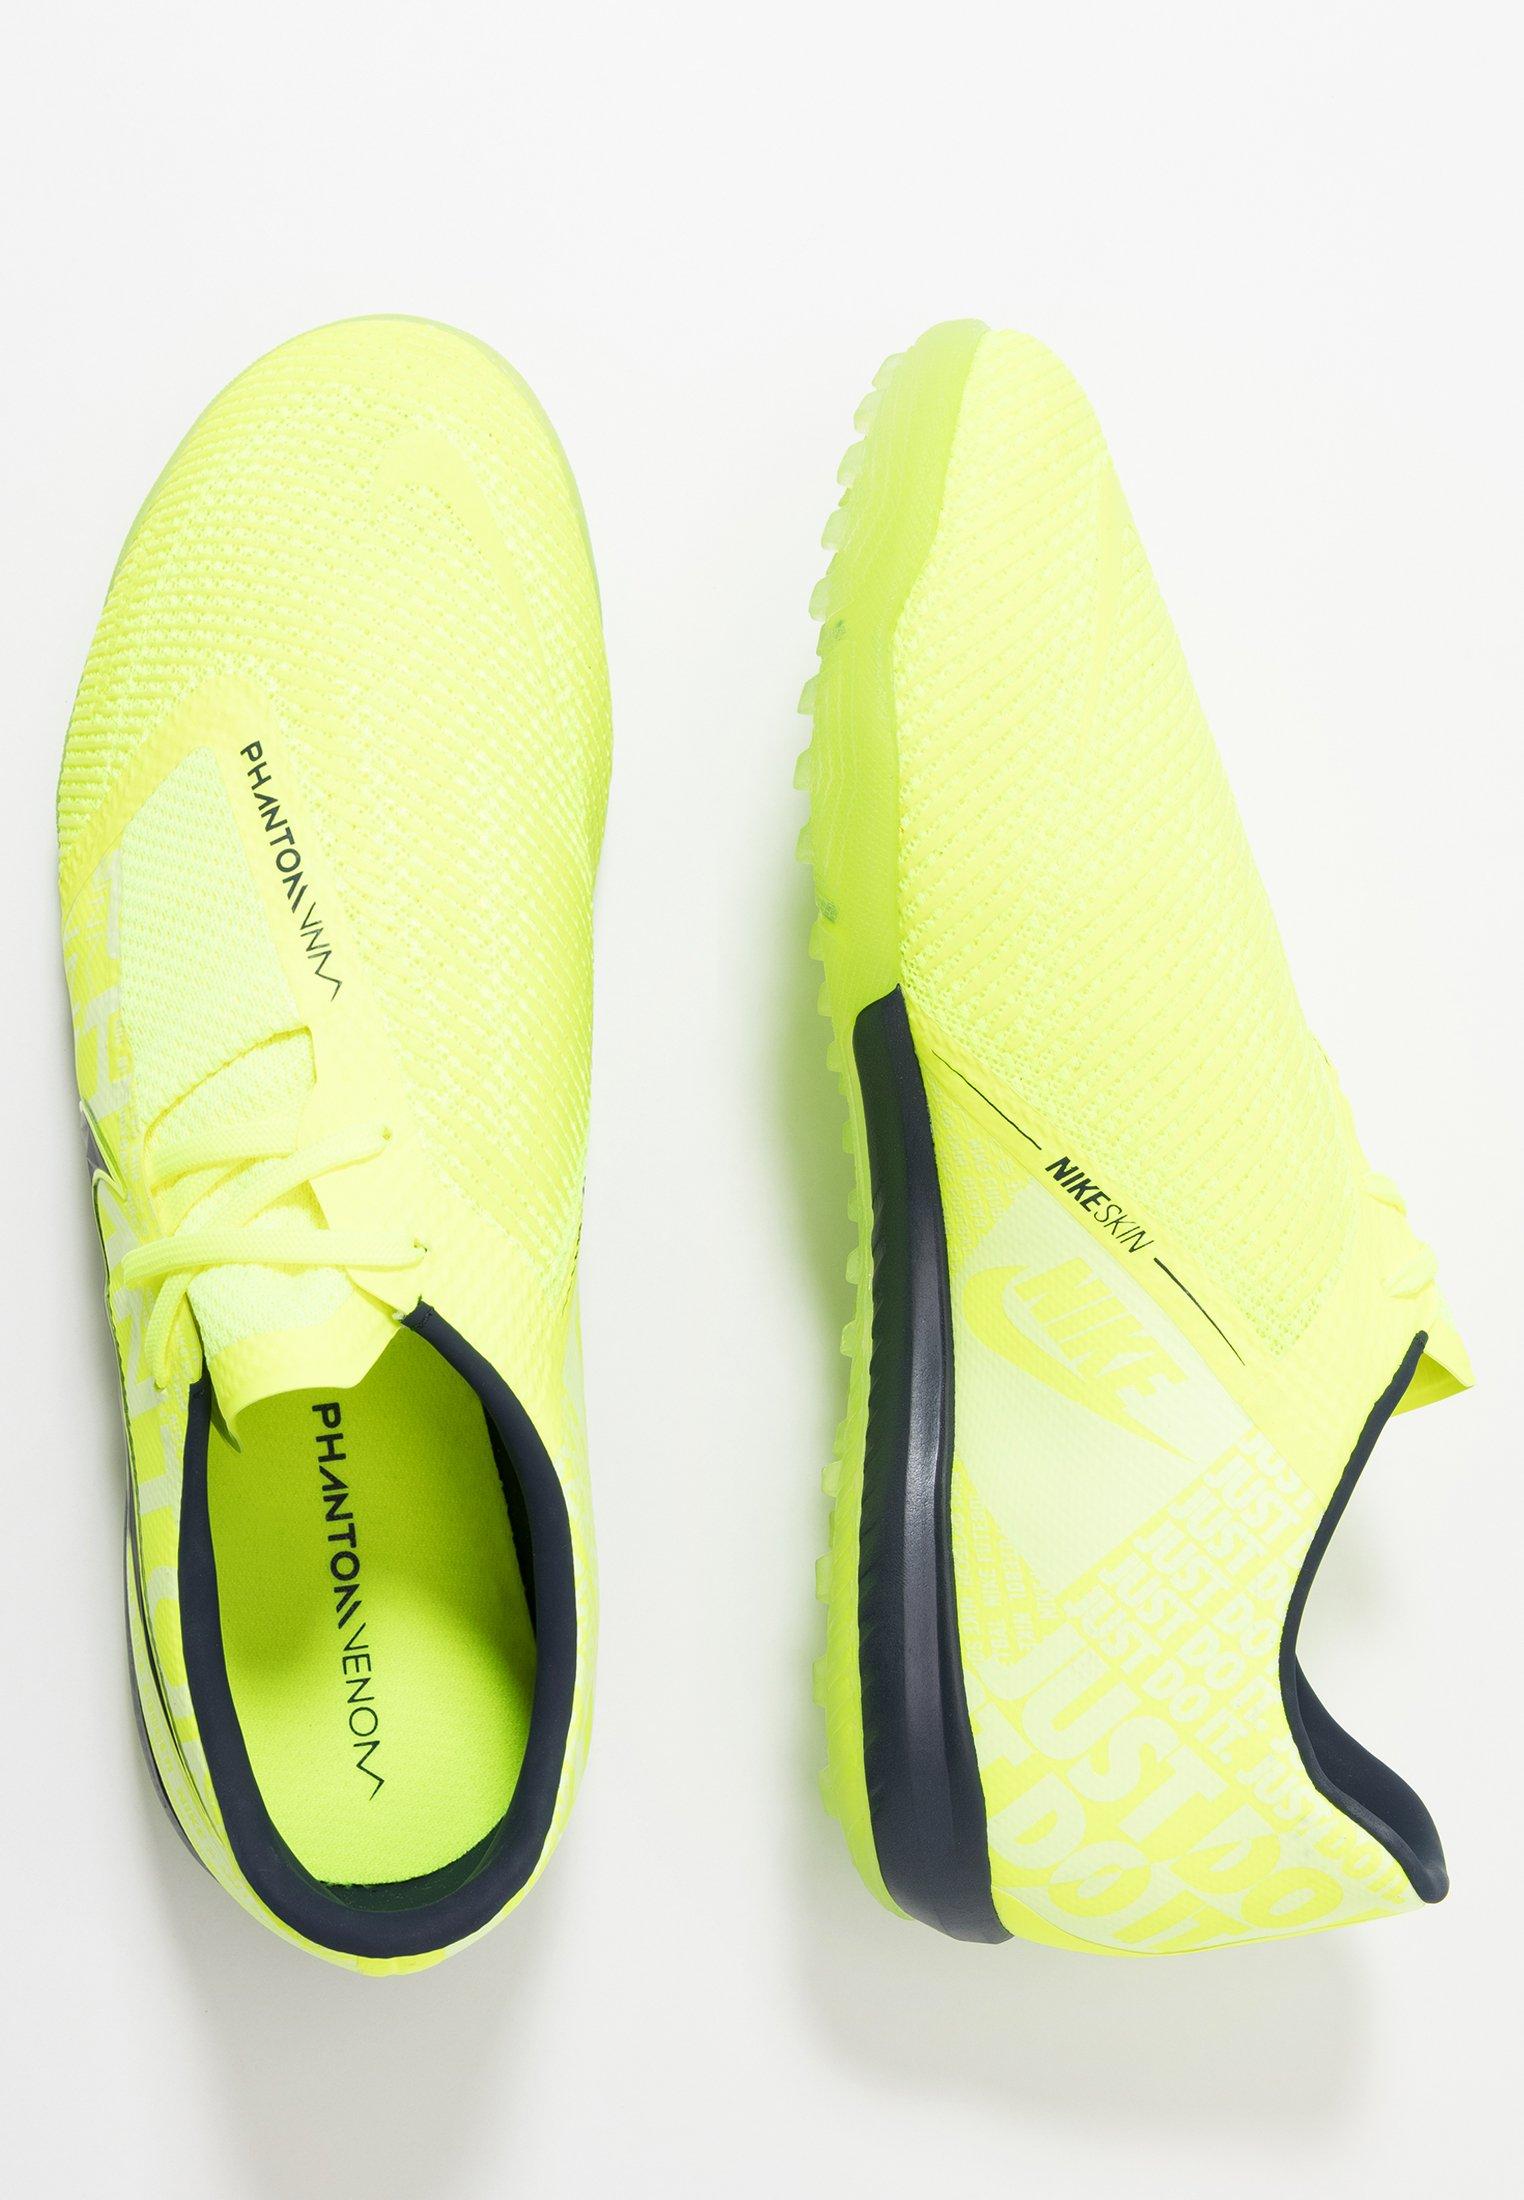 ZOOM PHANTOM PRO TF Chaussures de foot multicrampons voltobsidianbarely volt